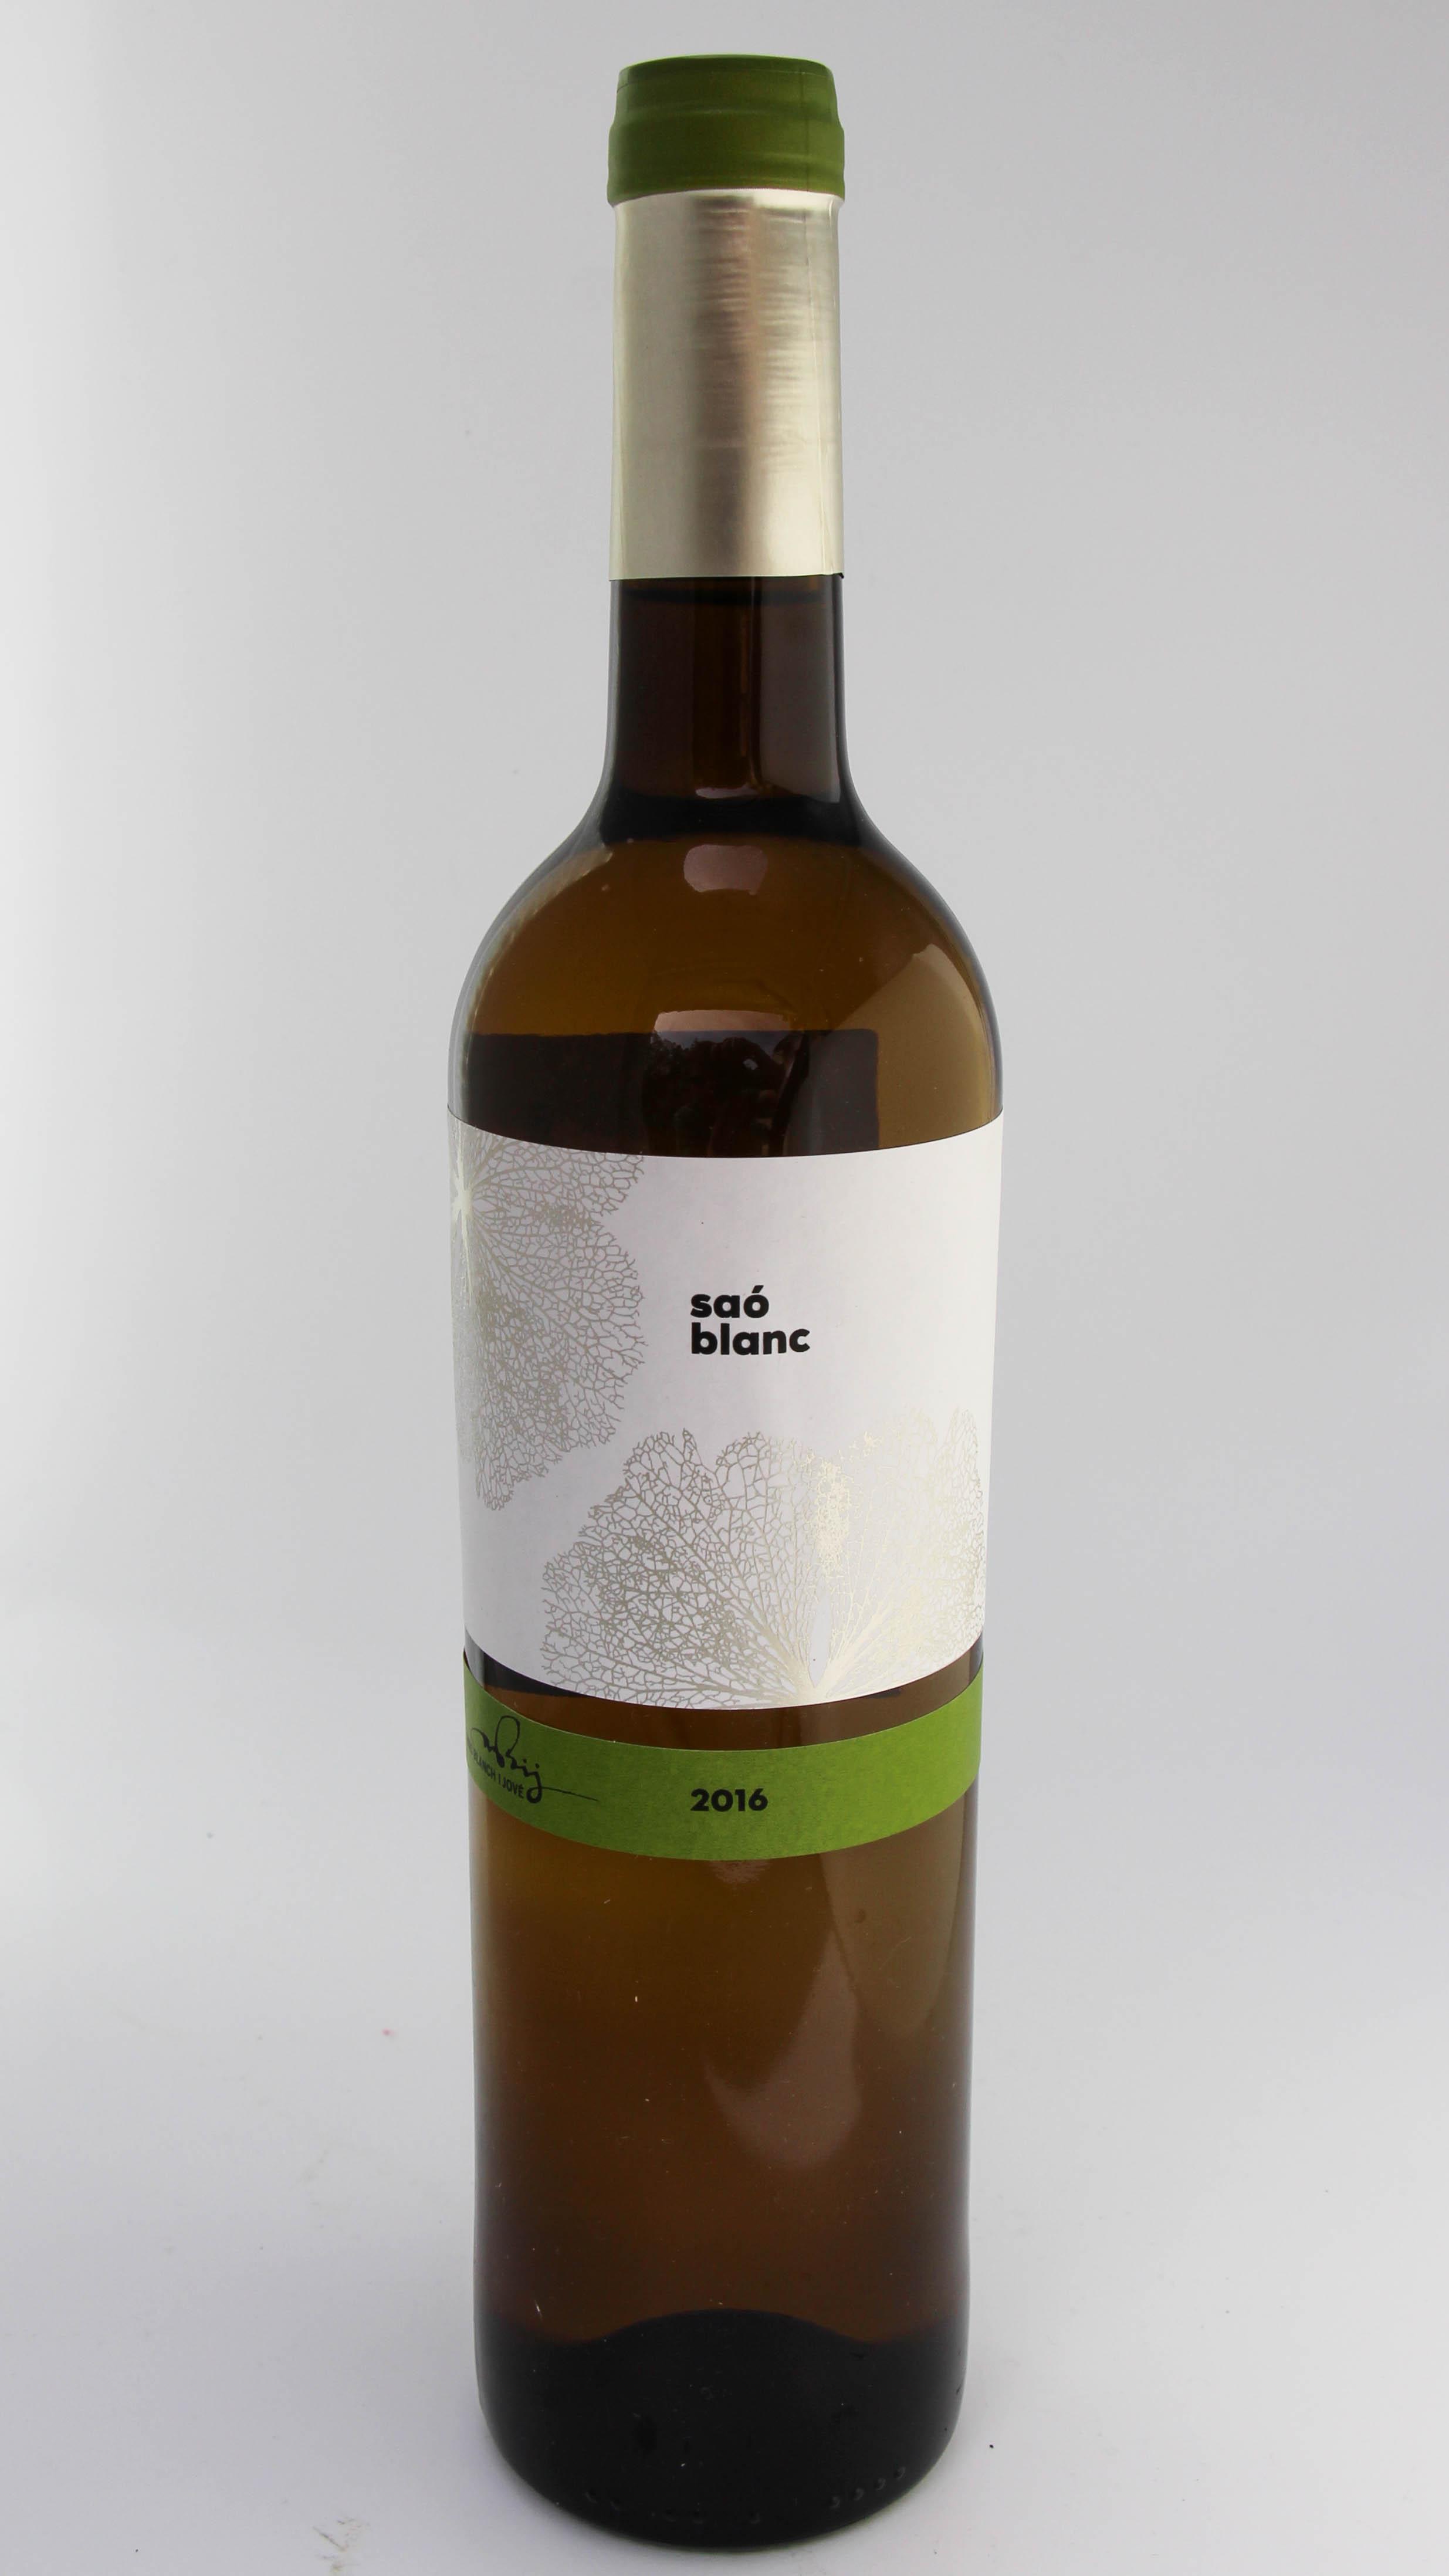 Produktbild Sao Blanc